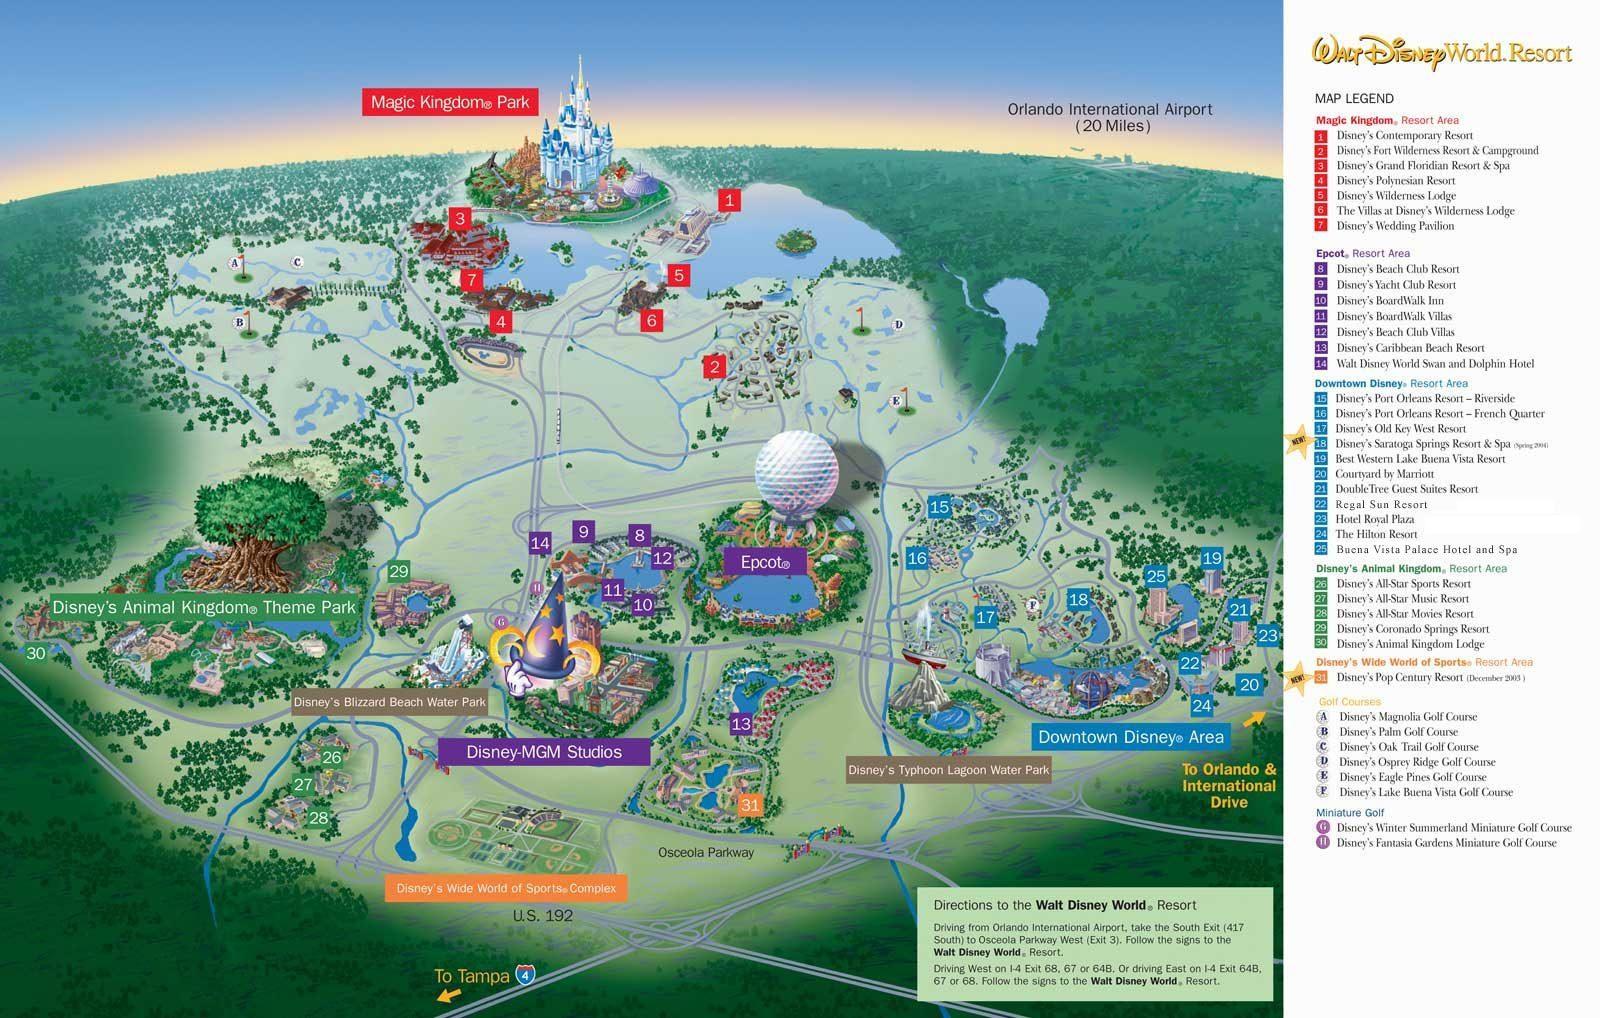 WDW Map Walt Disney World Photo 1462424 Fanpop